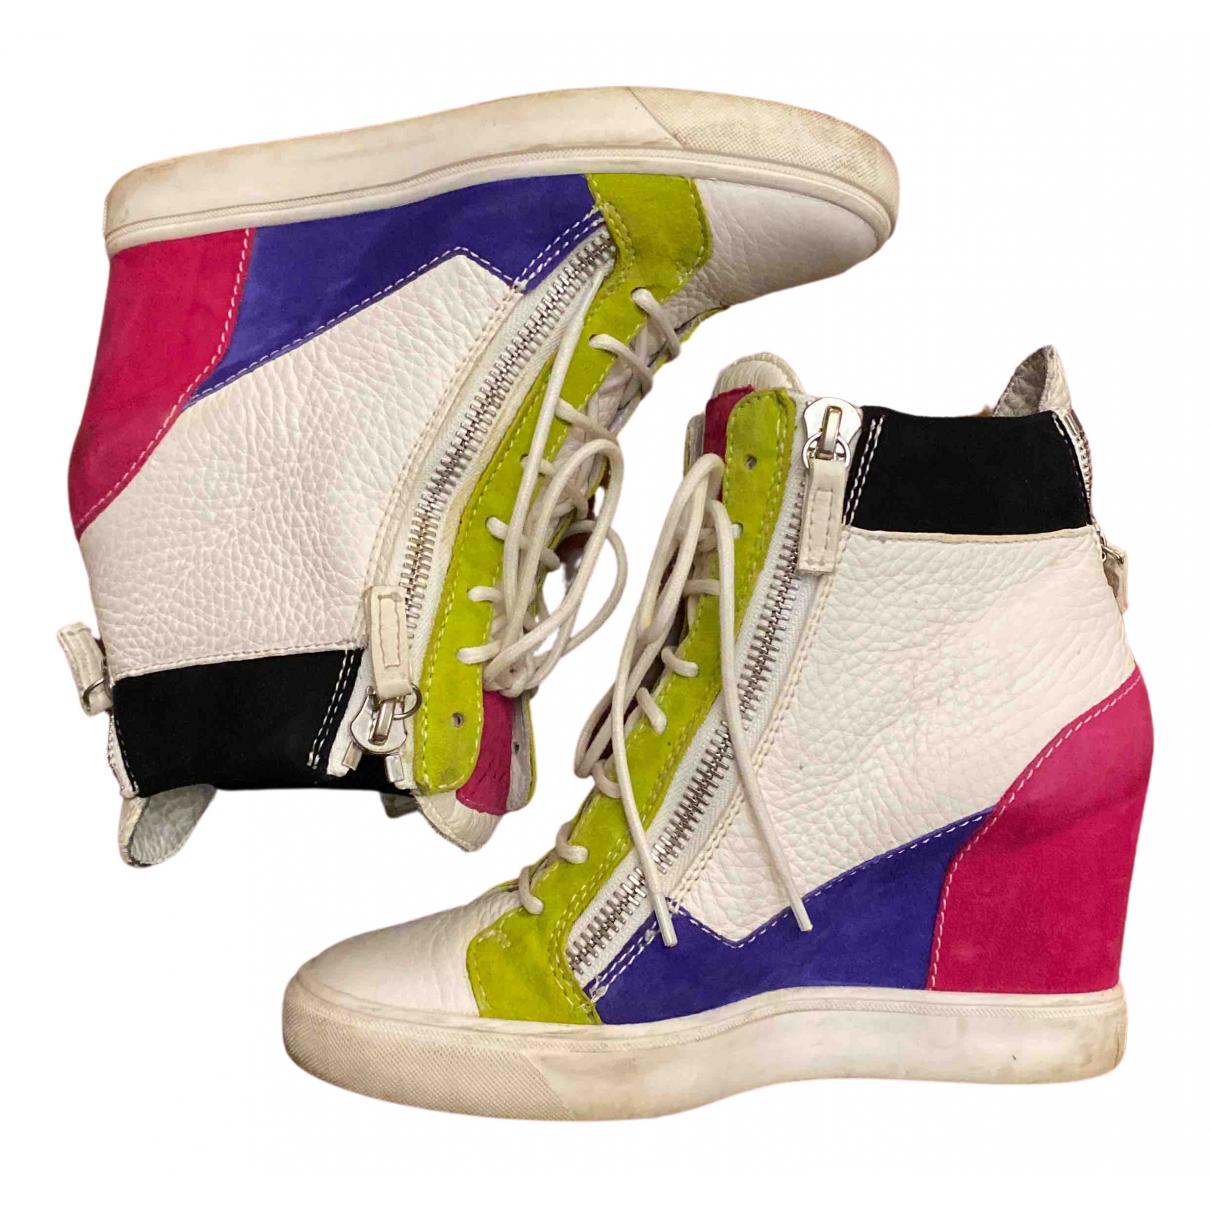 Giuseppe Zanotti - Baskets Donna pour femme en cuir verni - multicolore